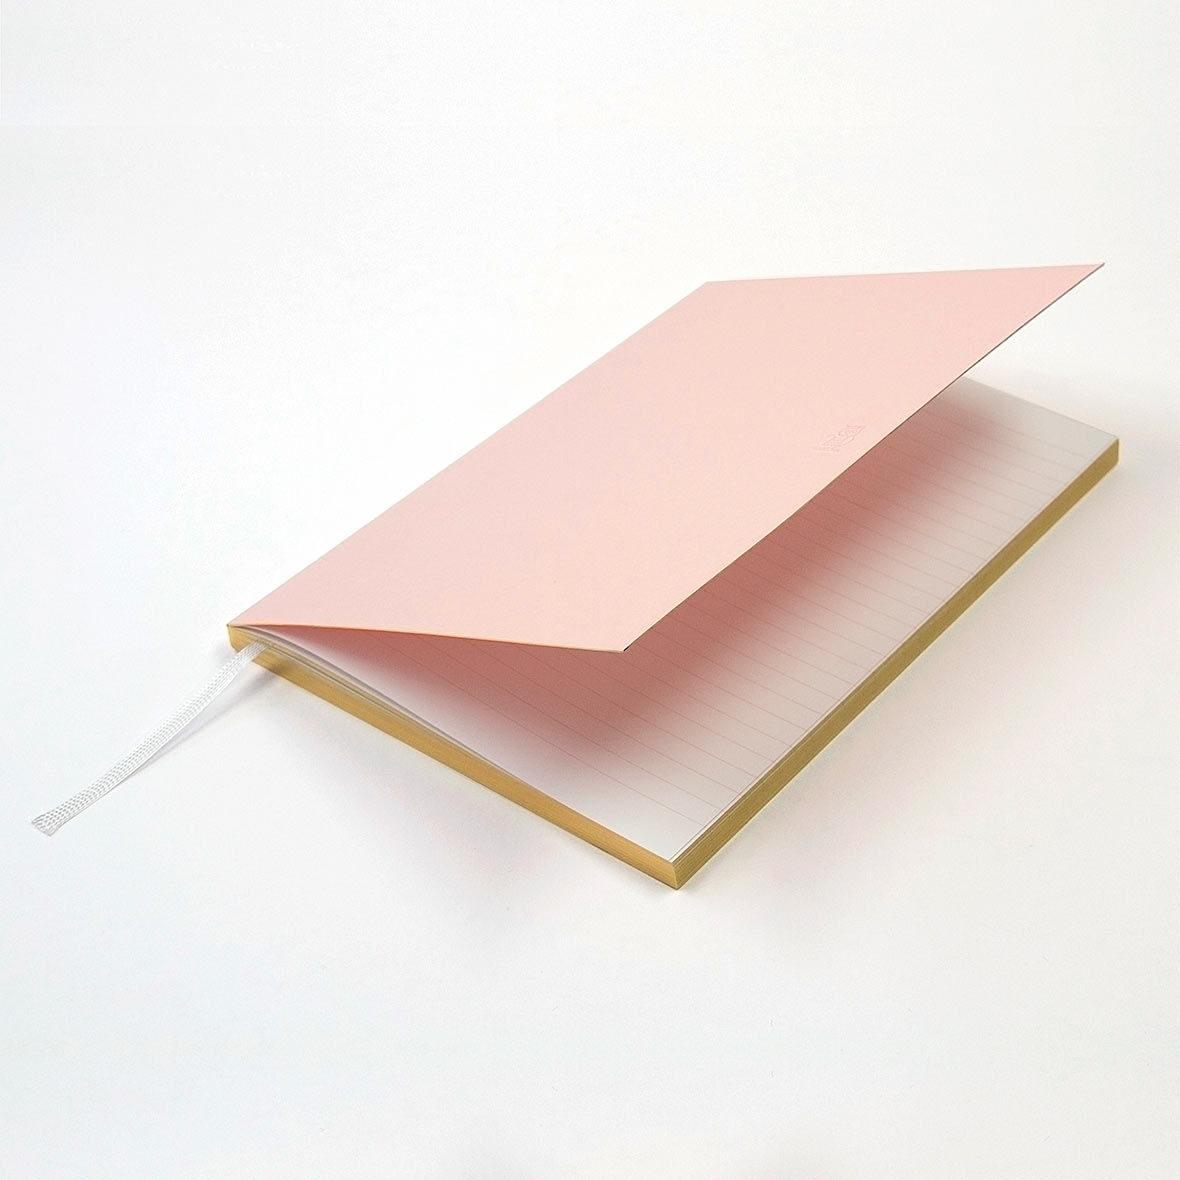 Notizbuch Vrenelisgärtli